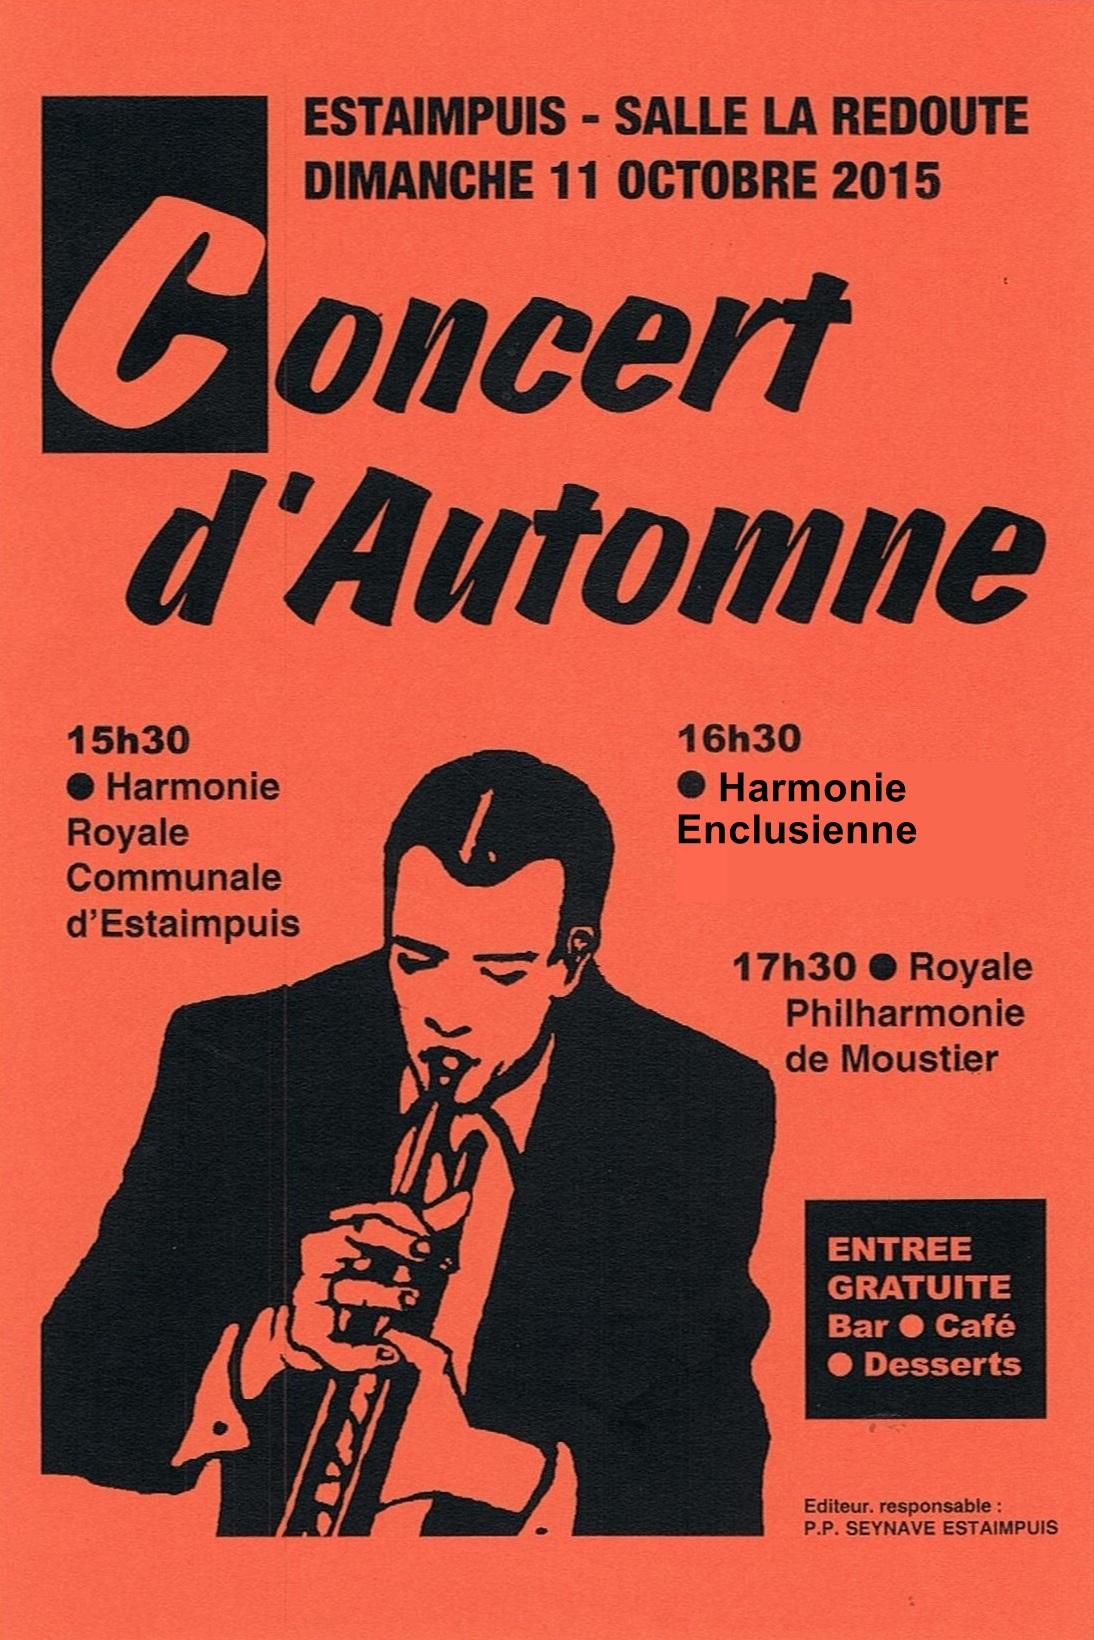 ConcertAutomne2015